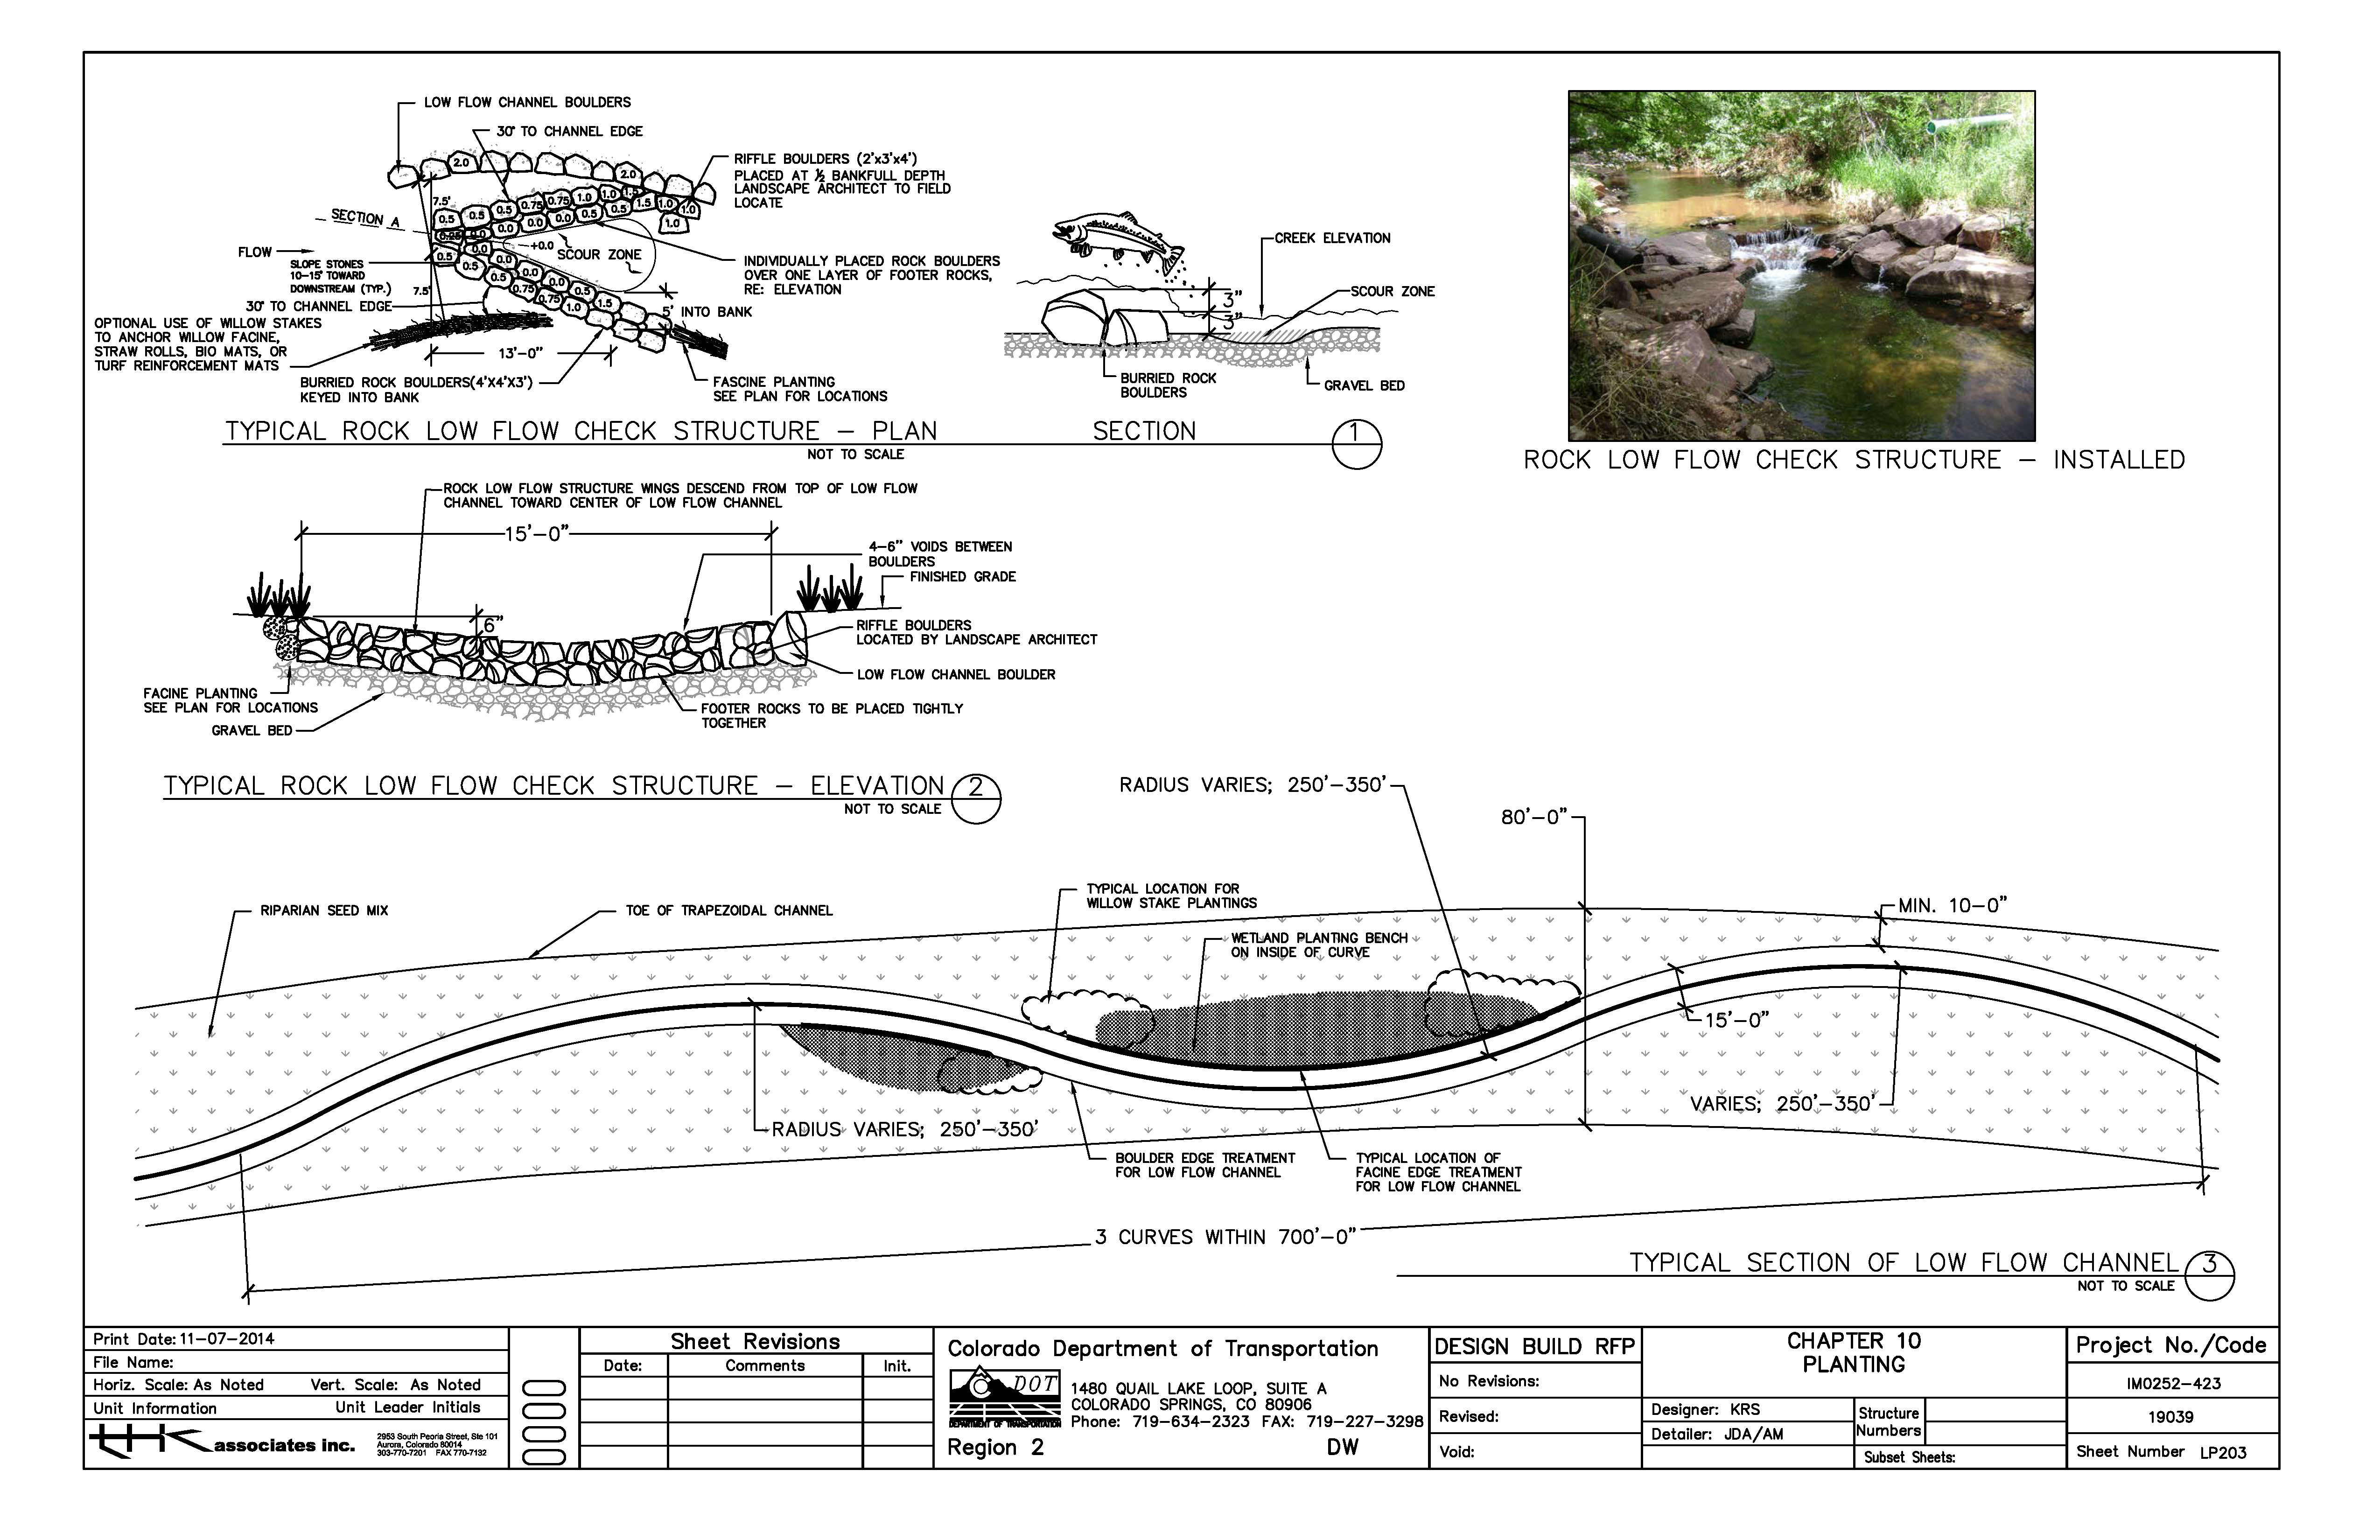 Creek restoration guidelines drawing